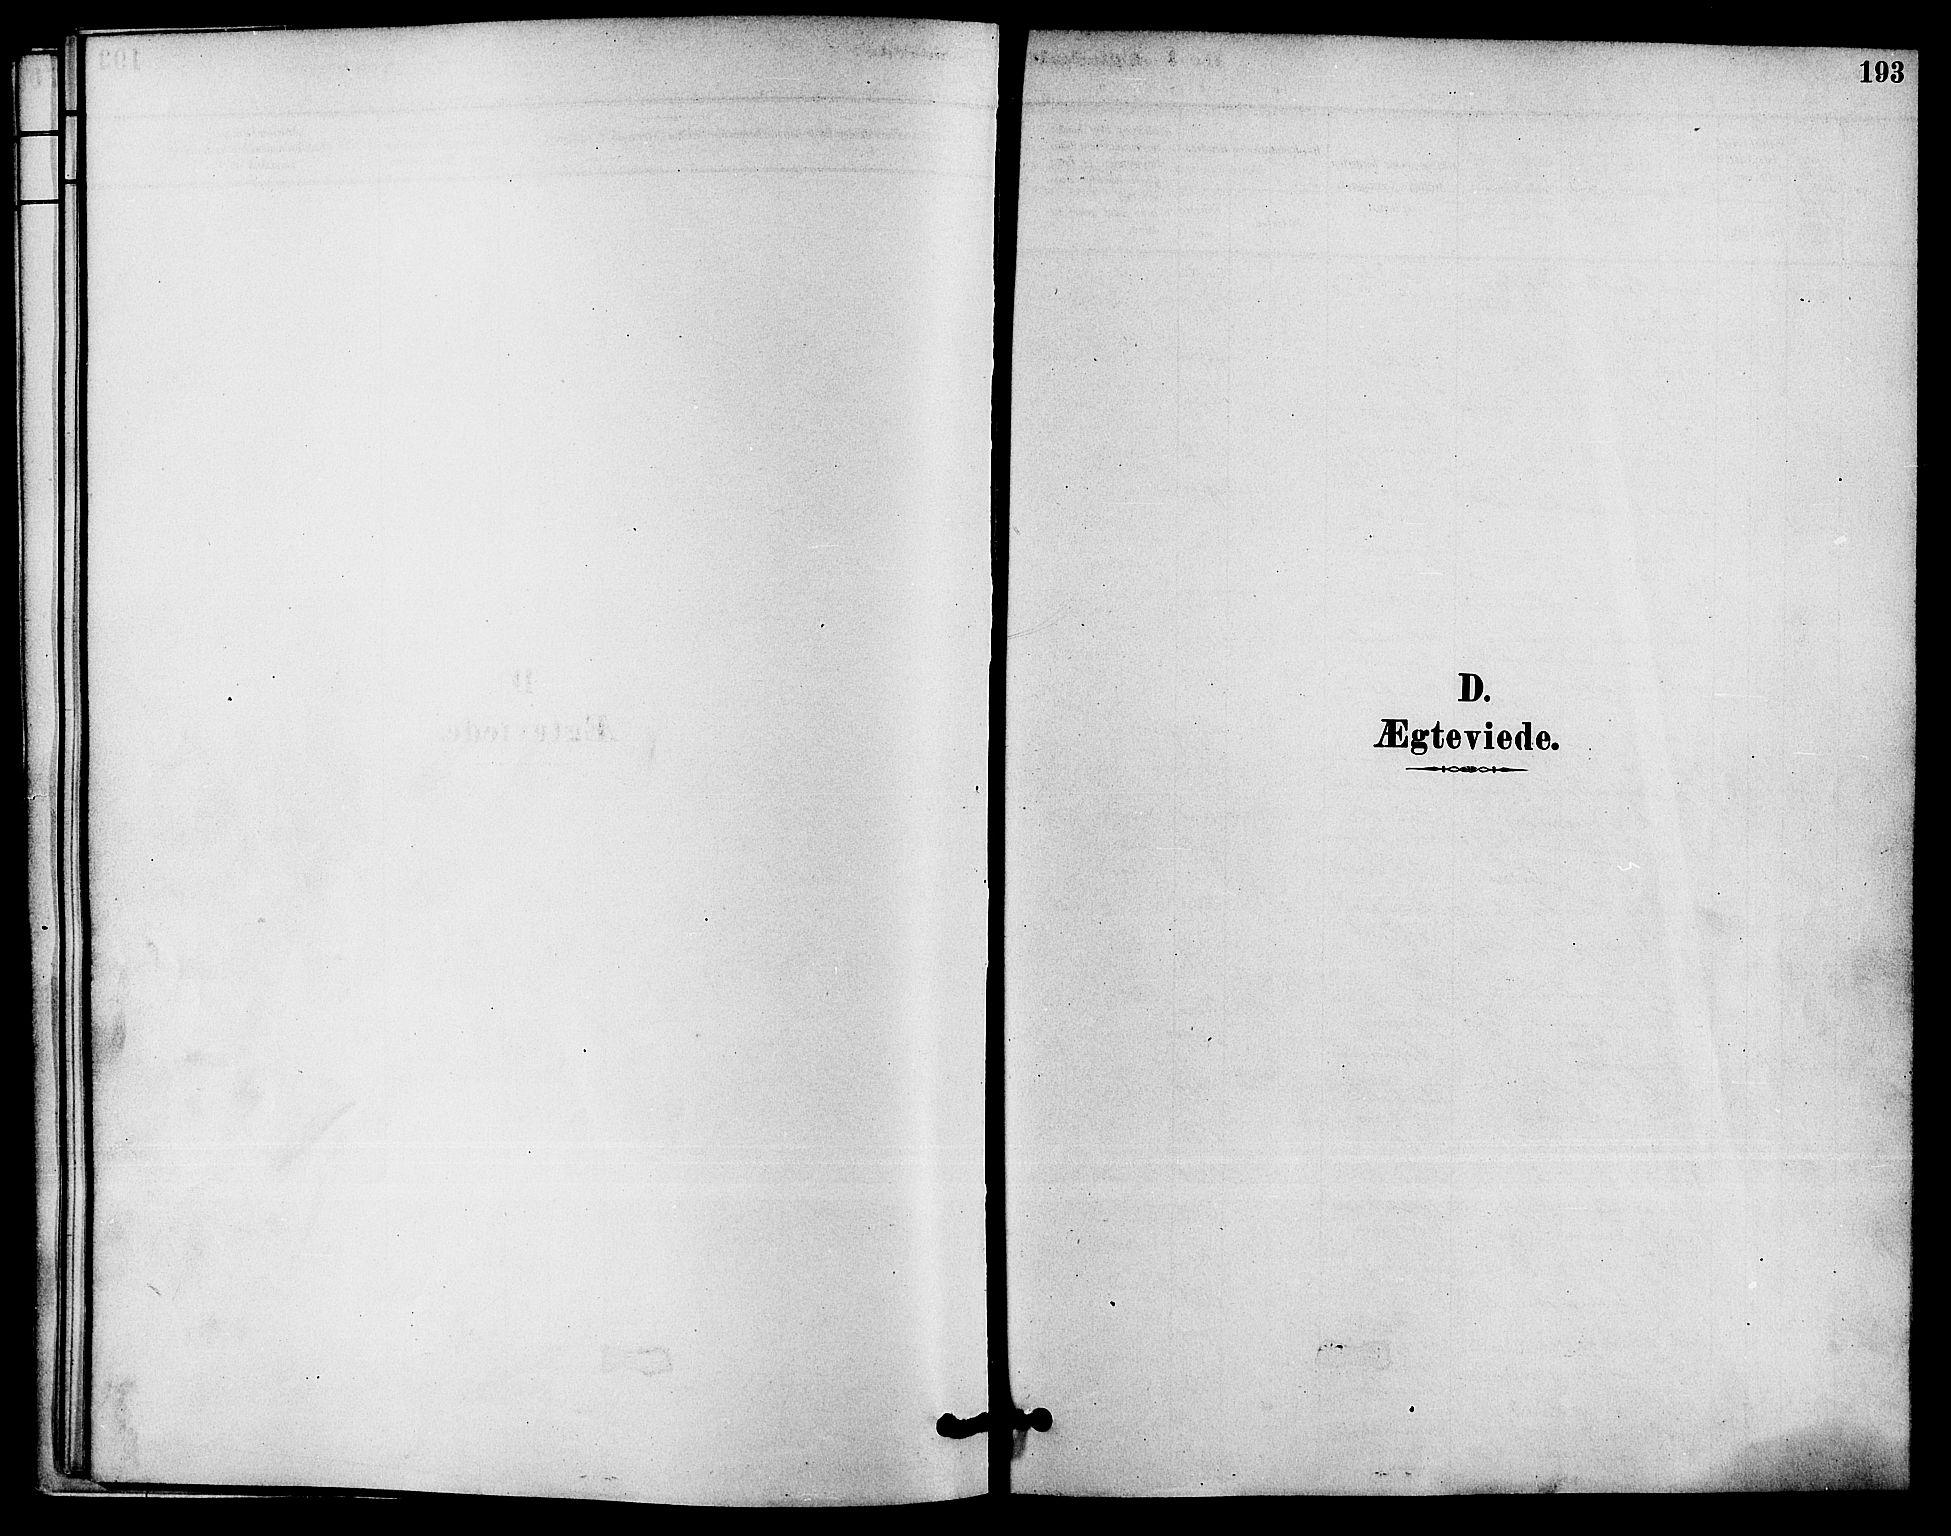 SAKO, Solum kirkebøker, F/Fa/L0009: Ministerialbok nr. I 9, 1877-1887, s. 193